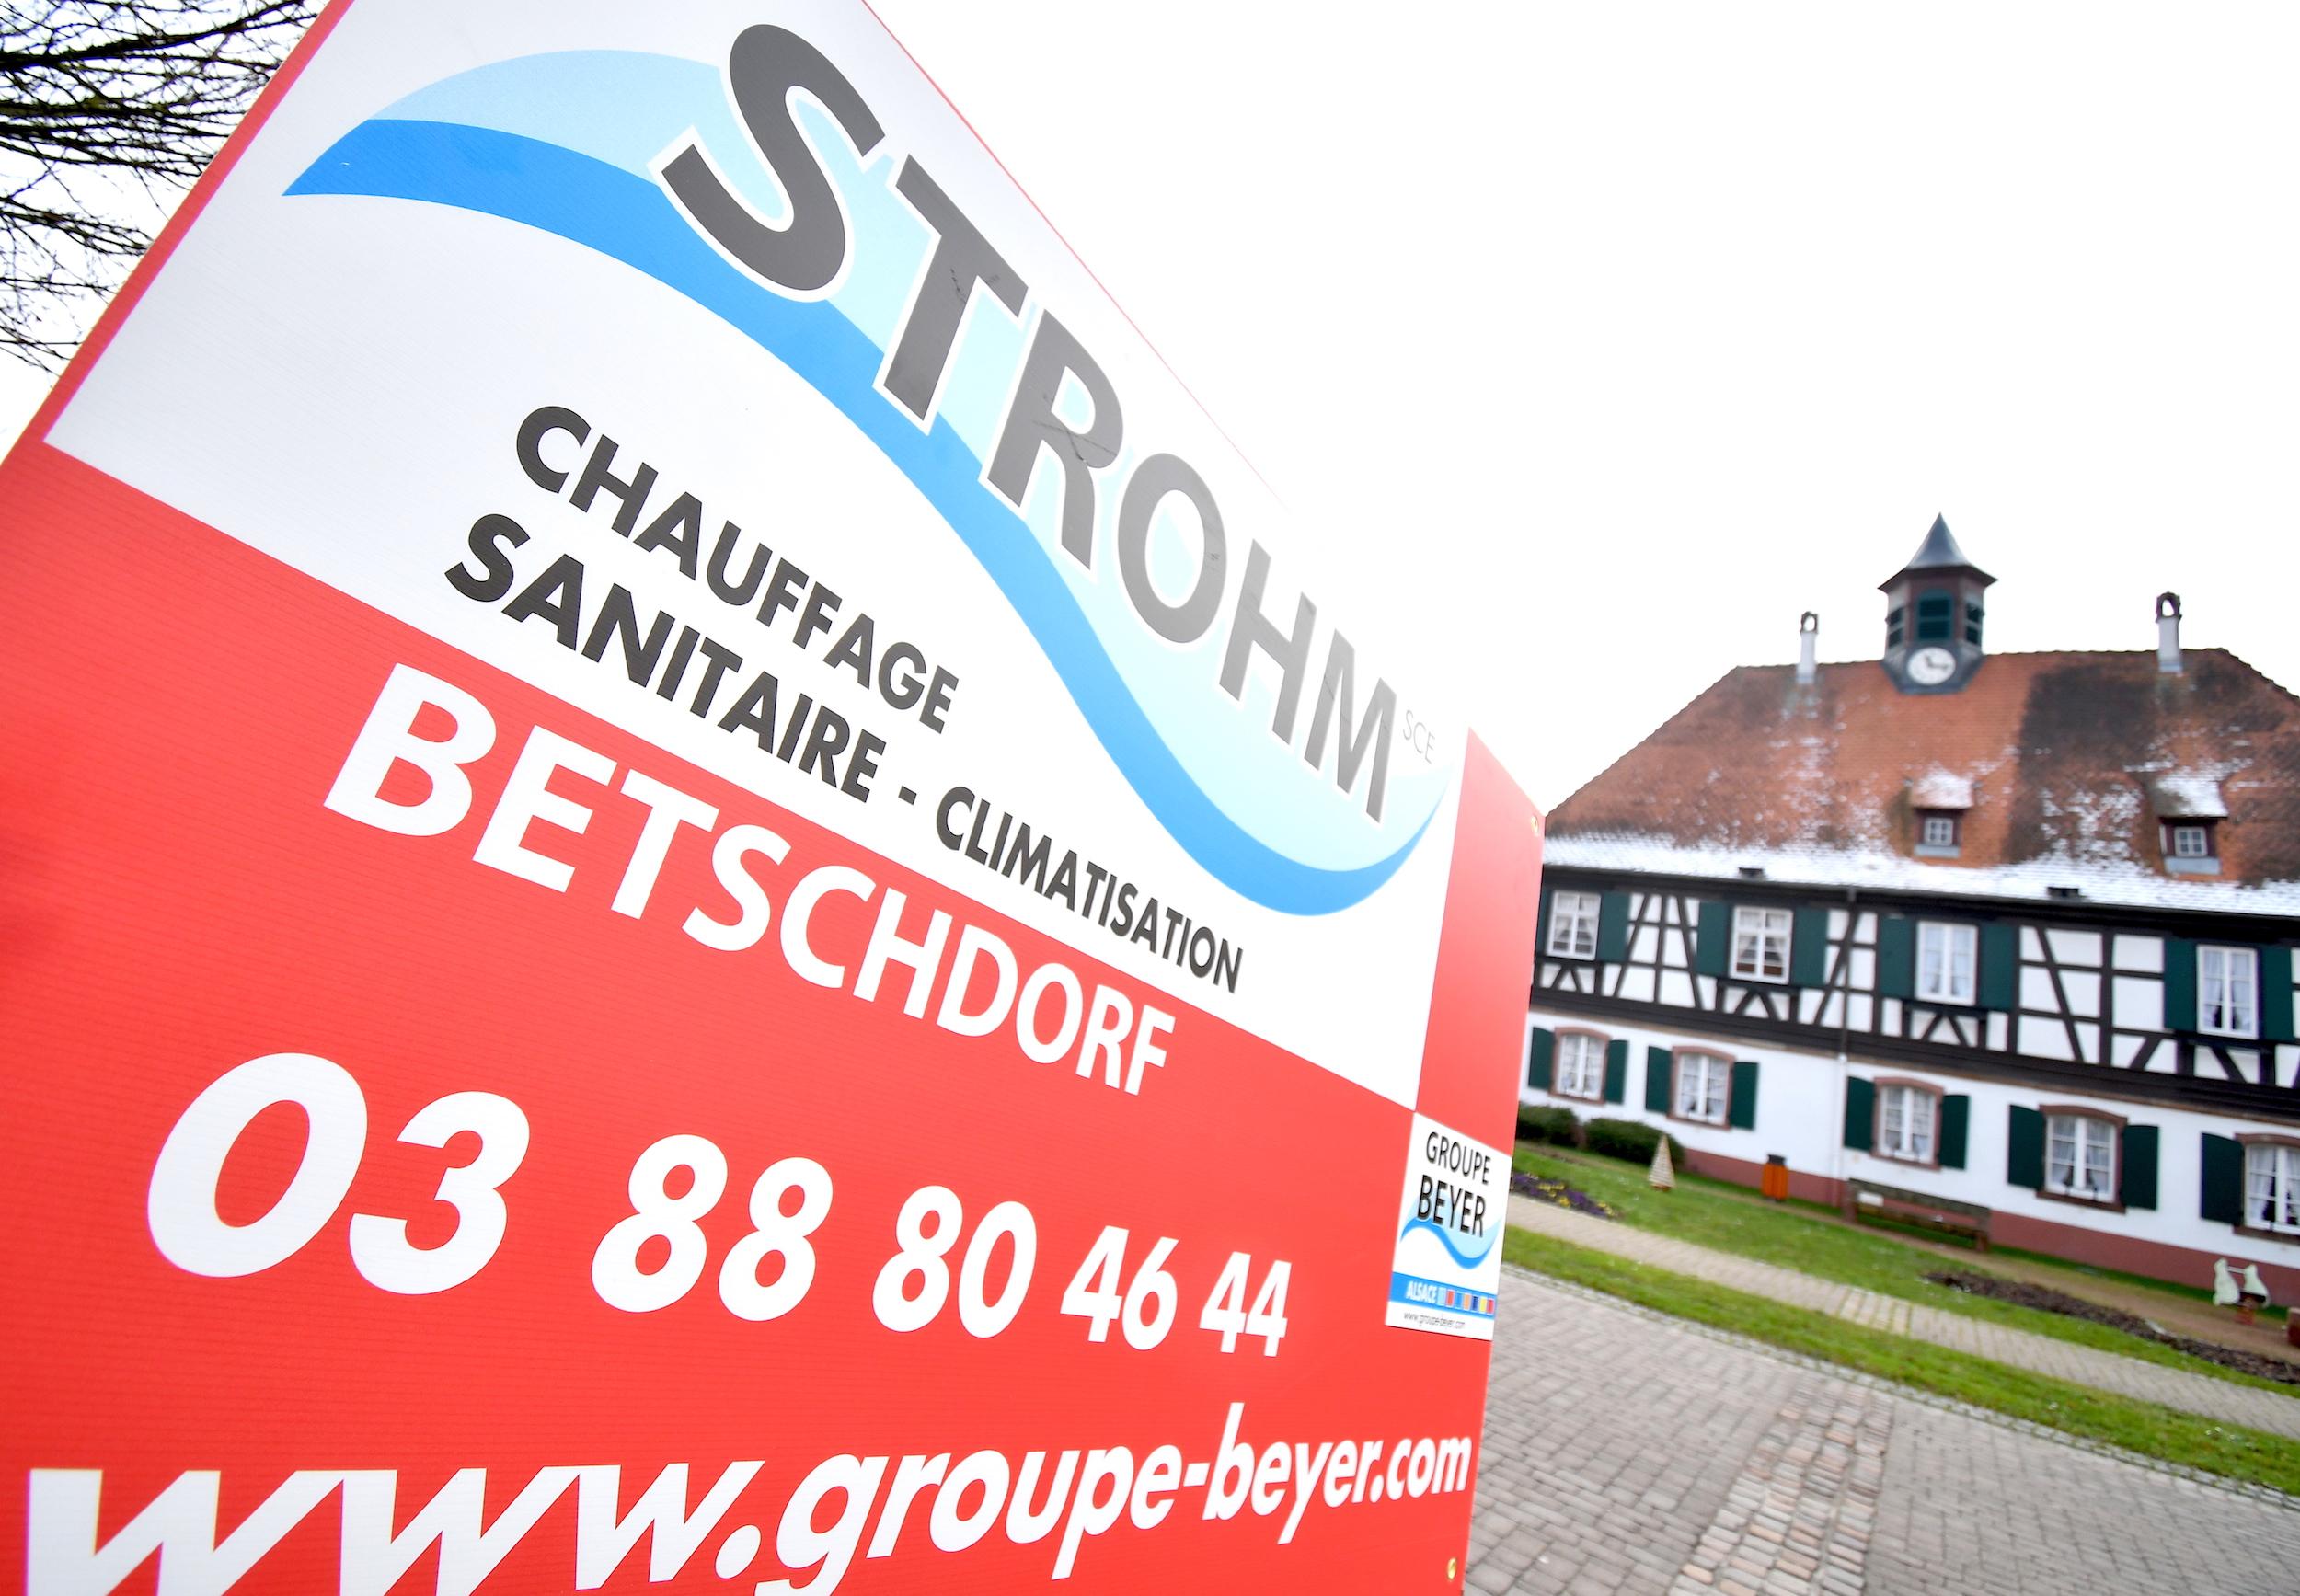 strohm_betschdorf_groupe_beyer_sanitaire_ventilation_couverture_4288